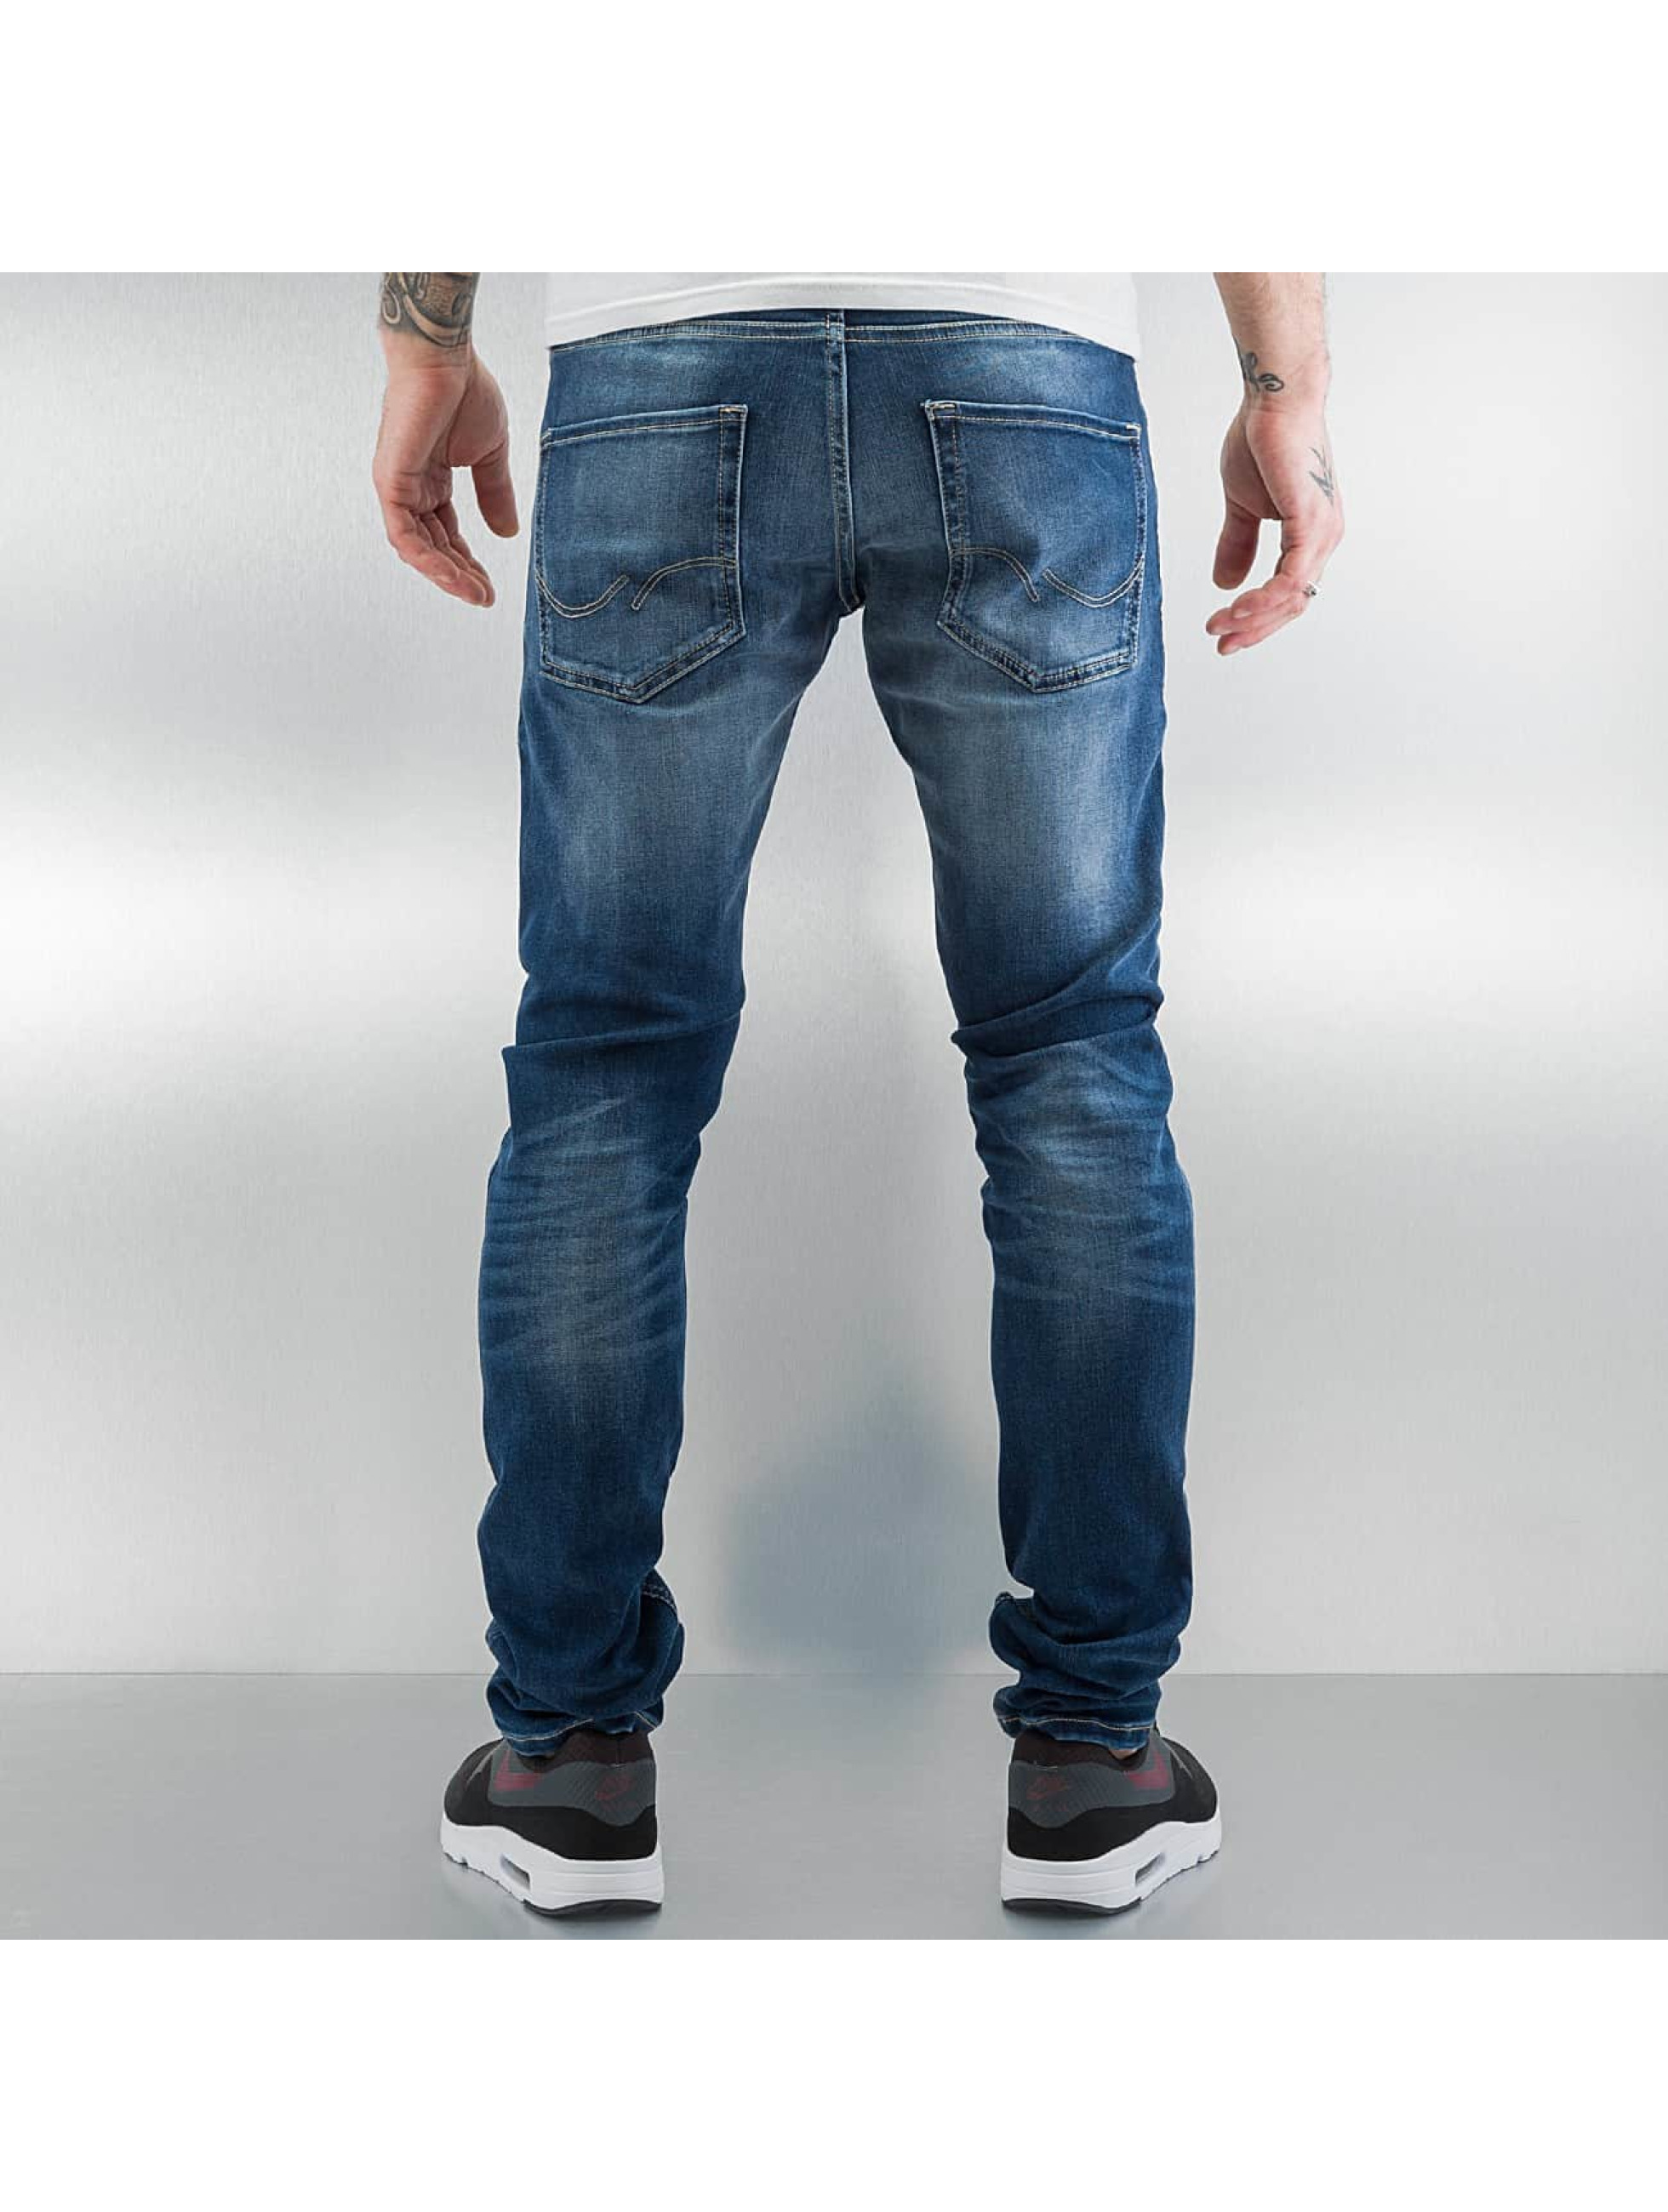 Jack & Jones Облегающие джинсы jjIglenn синий